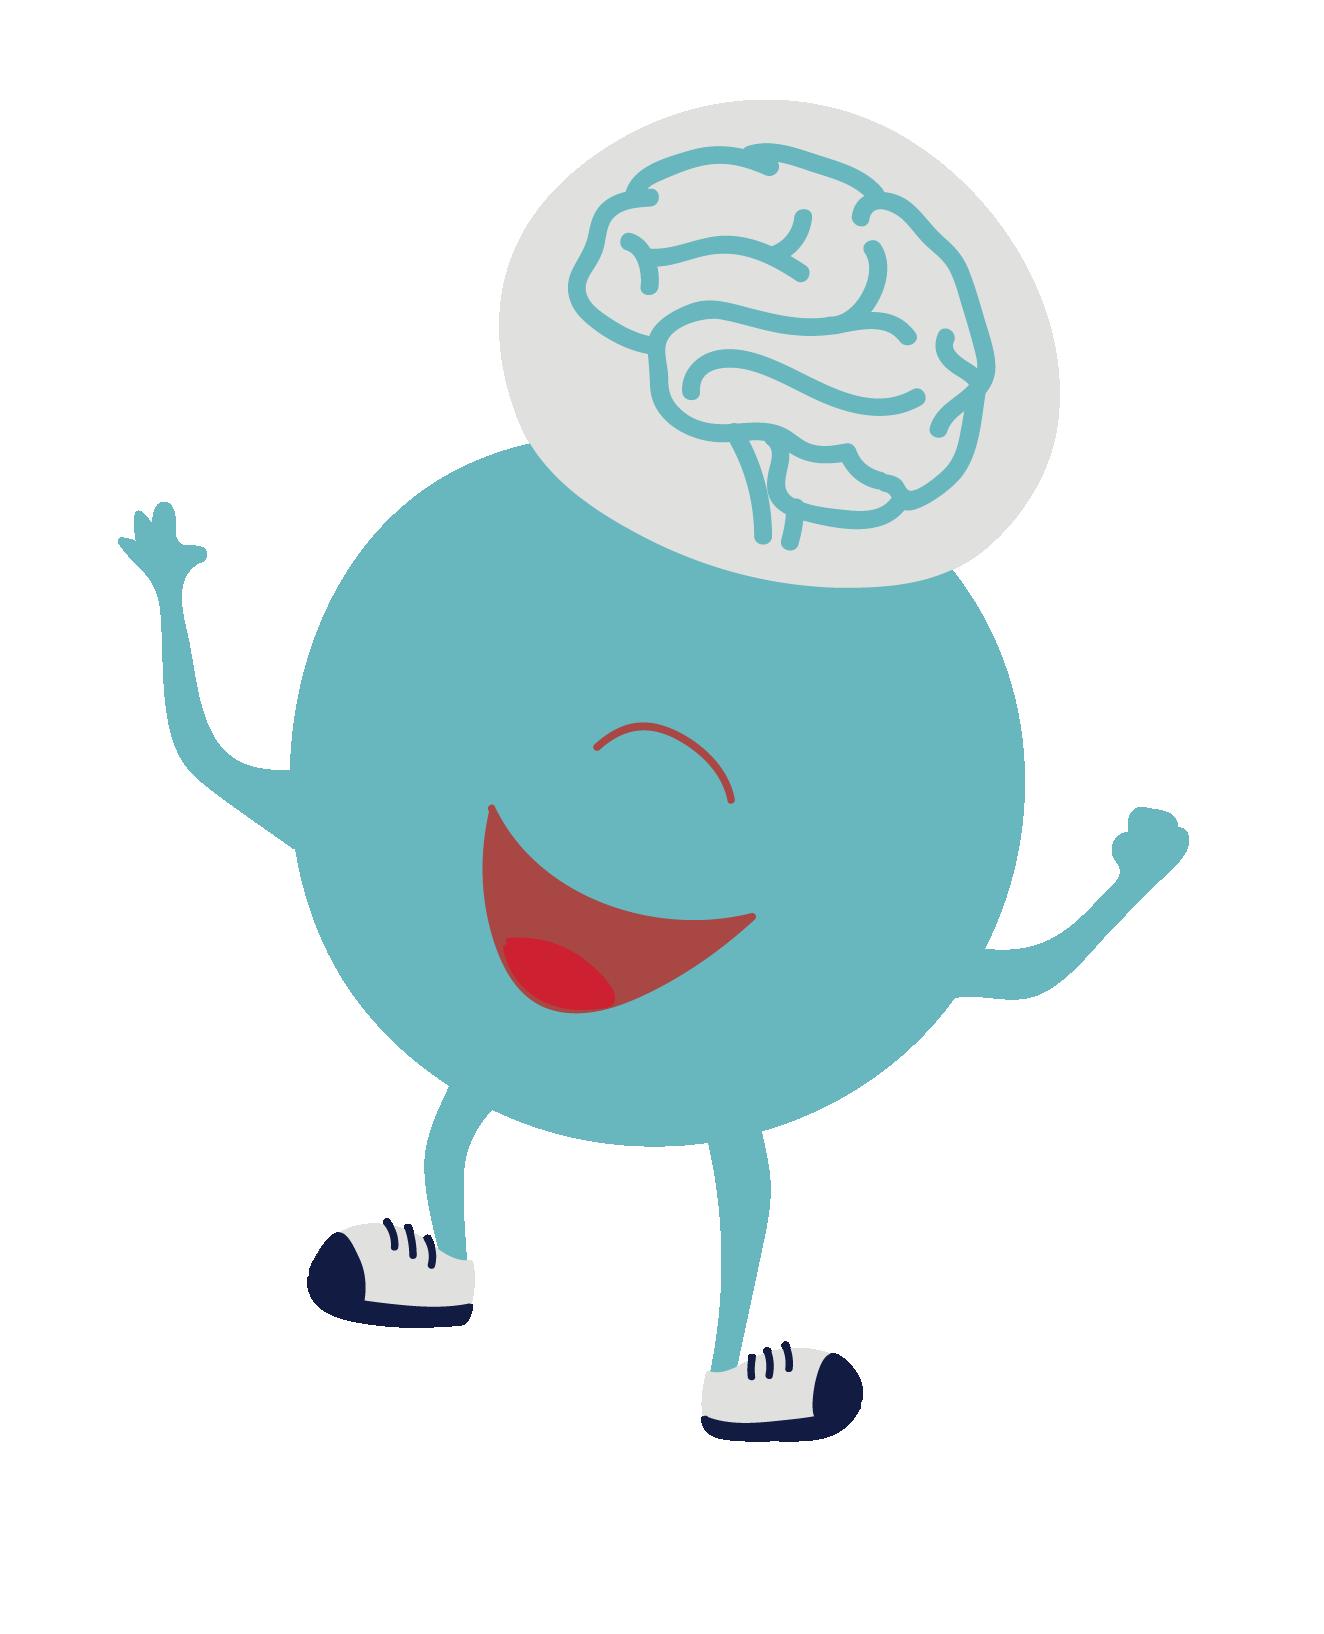 Brain Key  - brain character